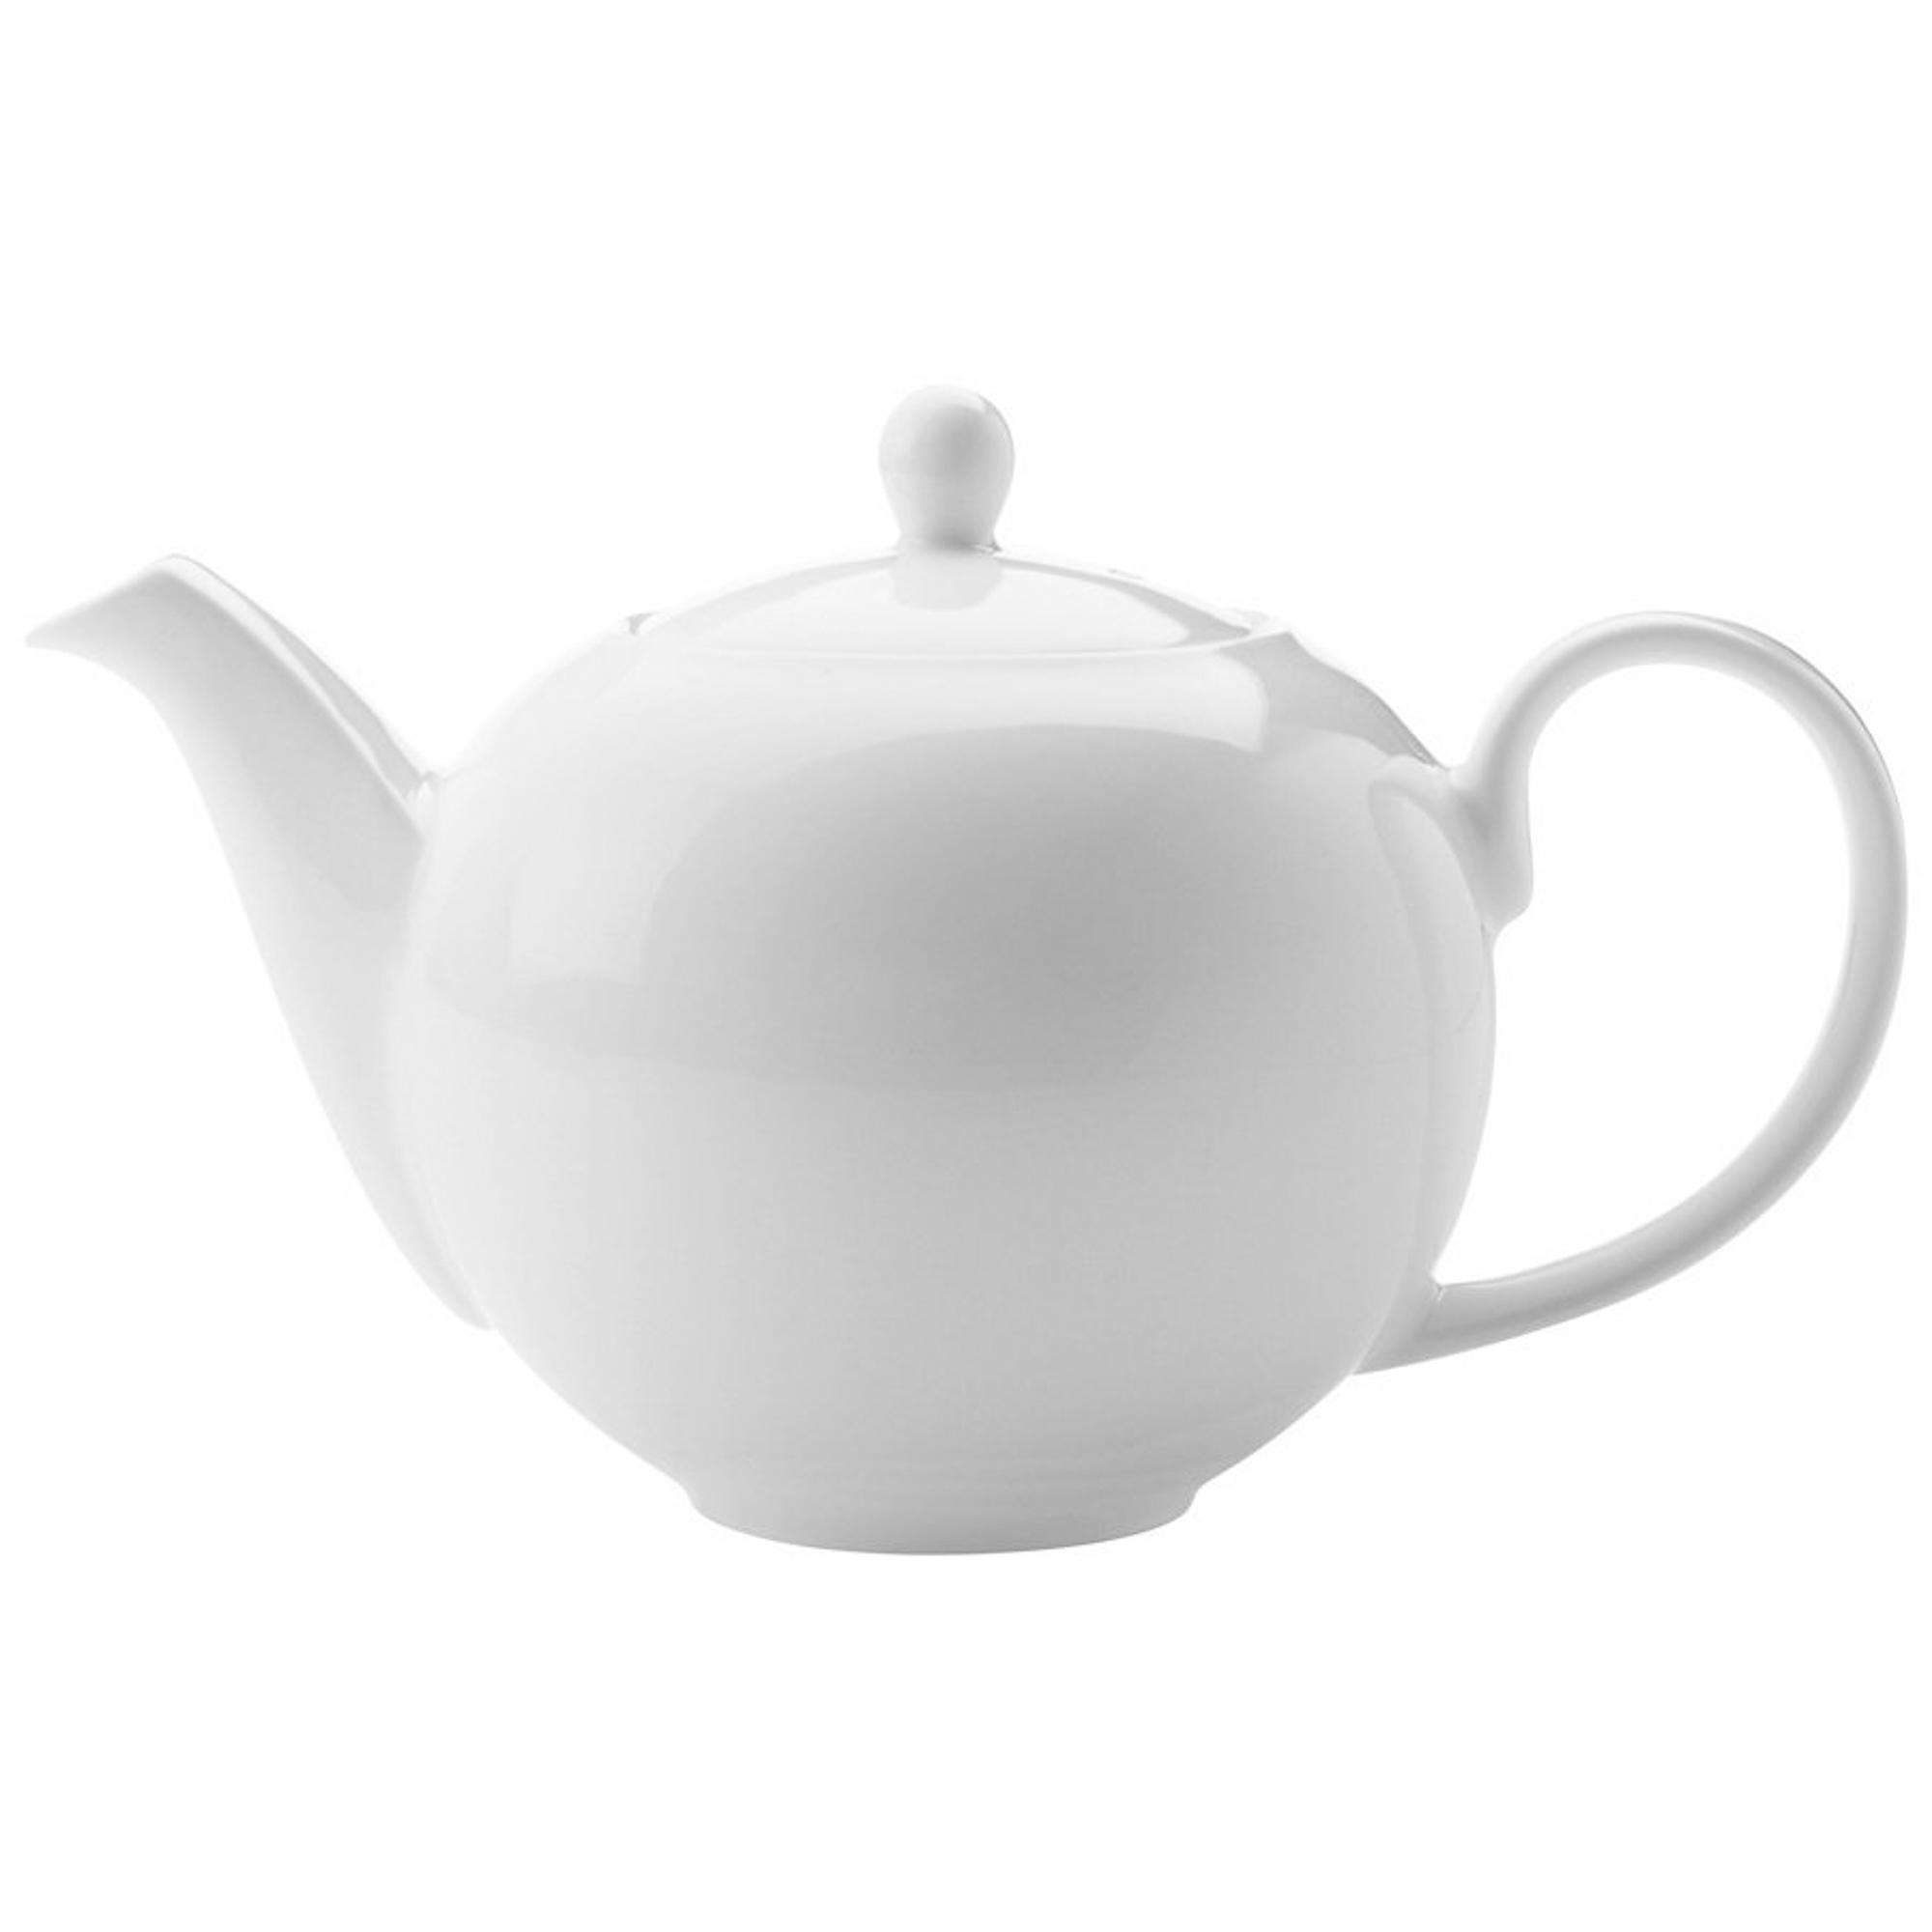 Чайник Maxwell & williams Белая коллекция 1 л фото